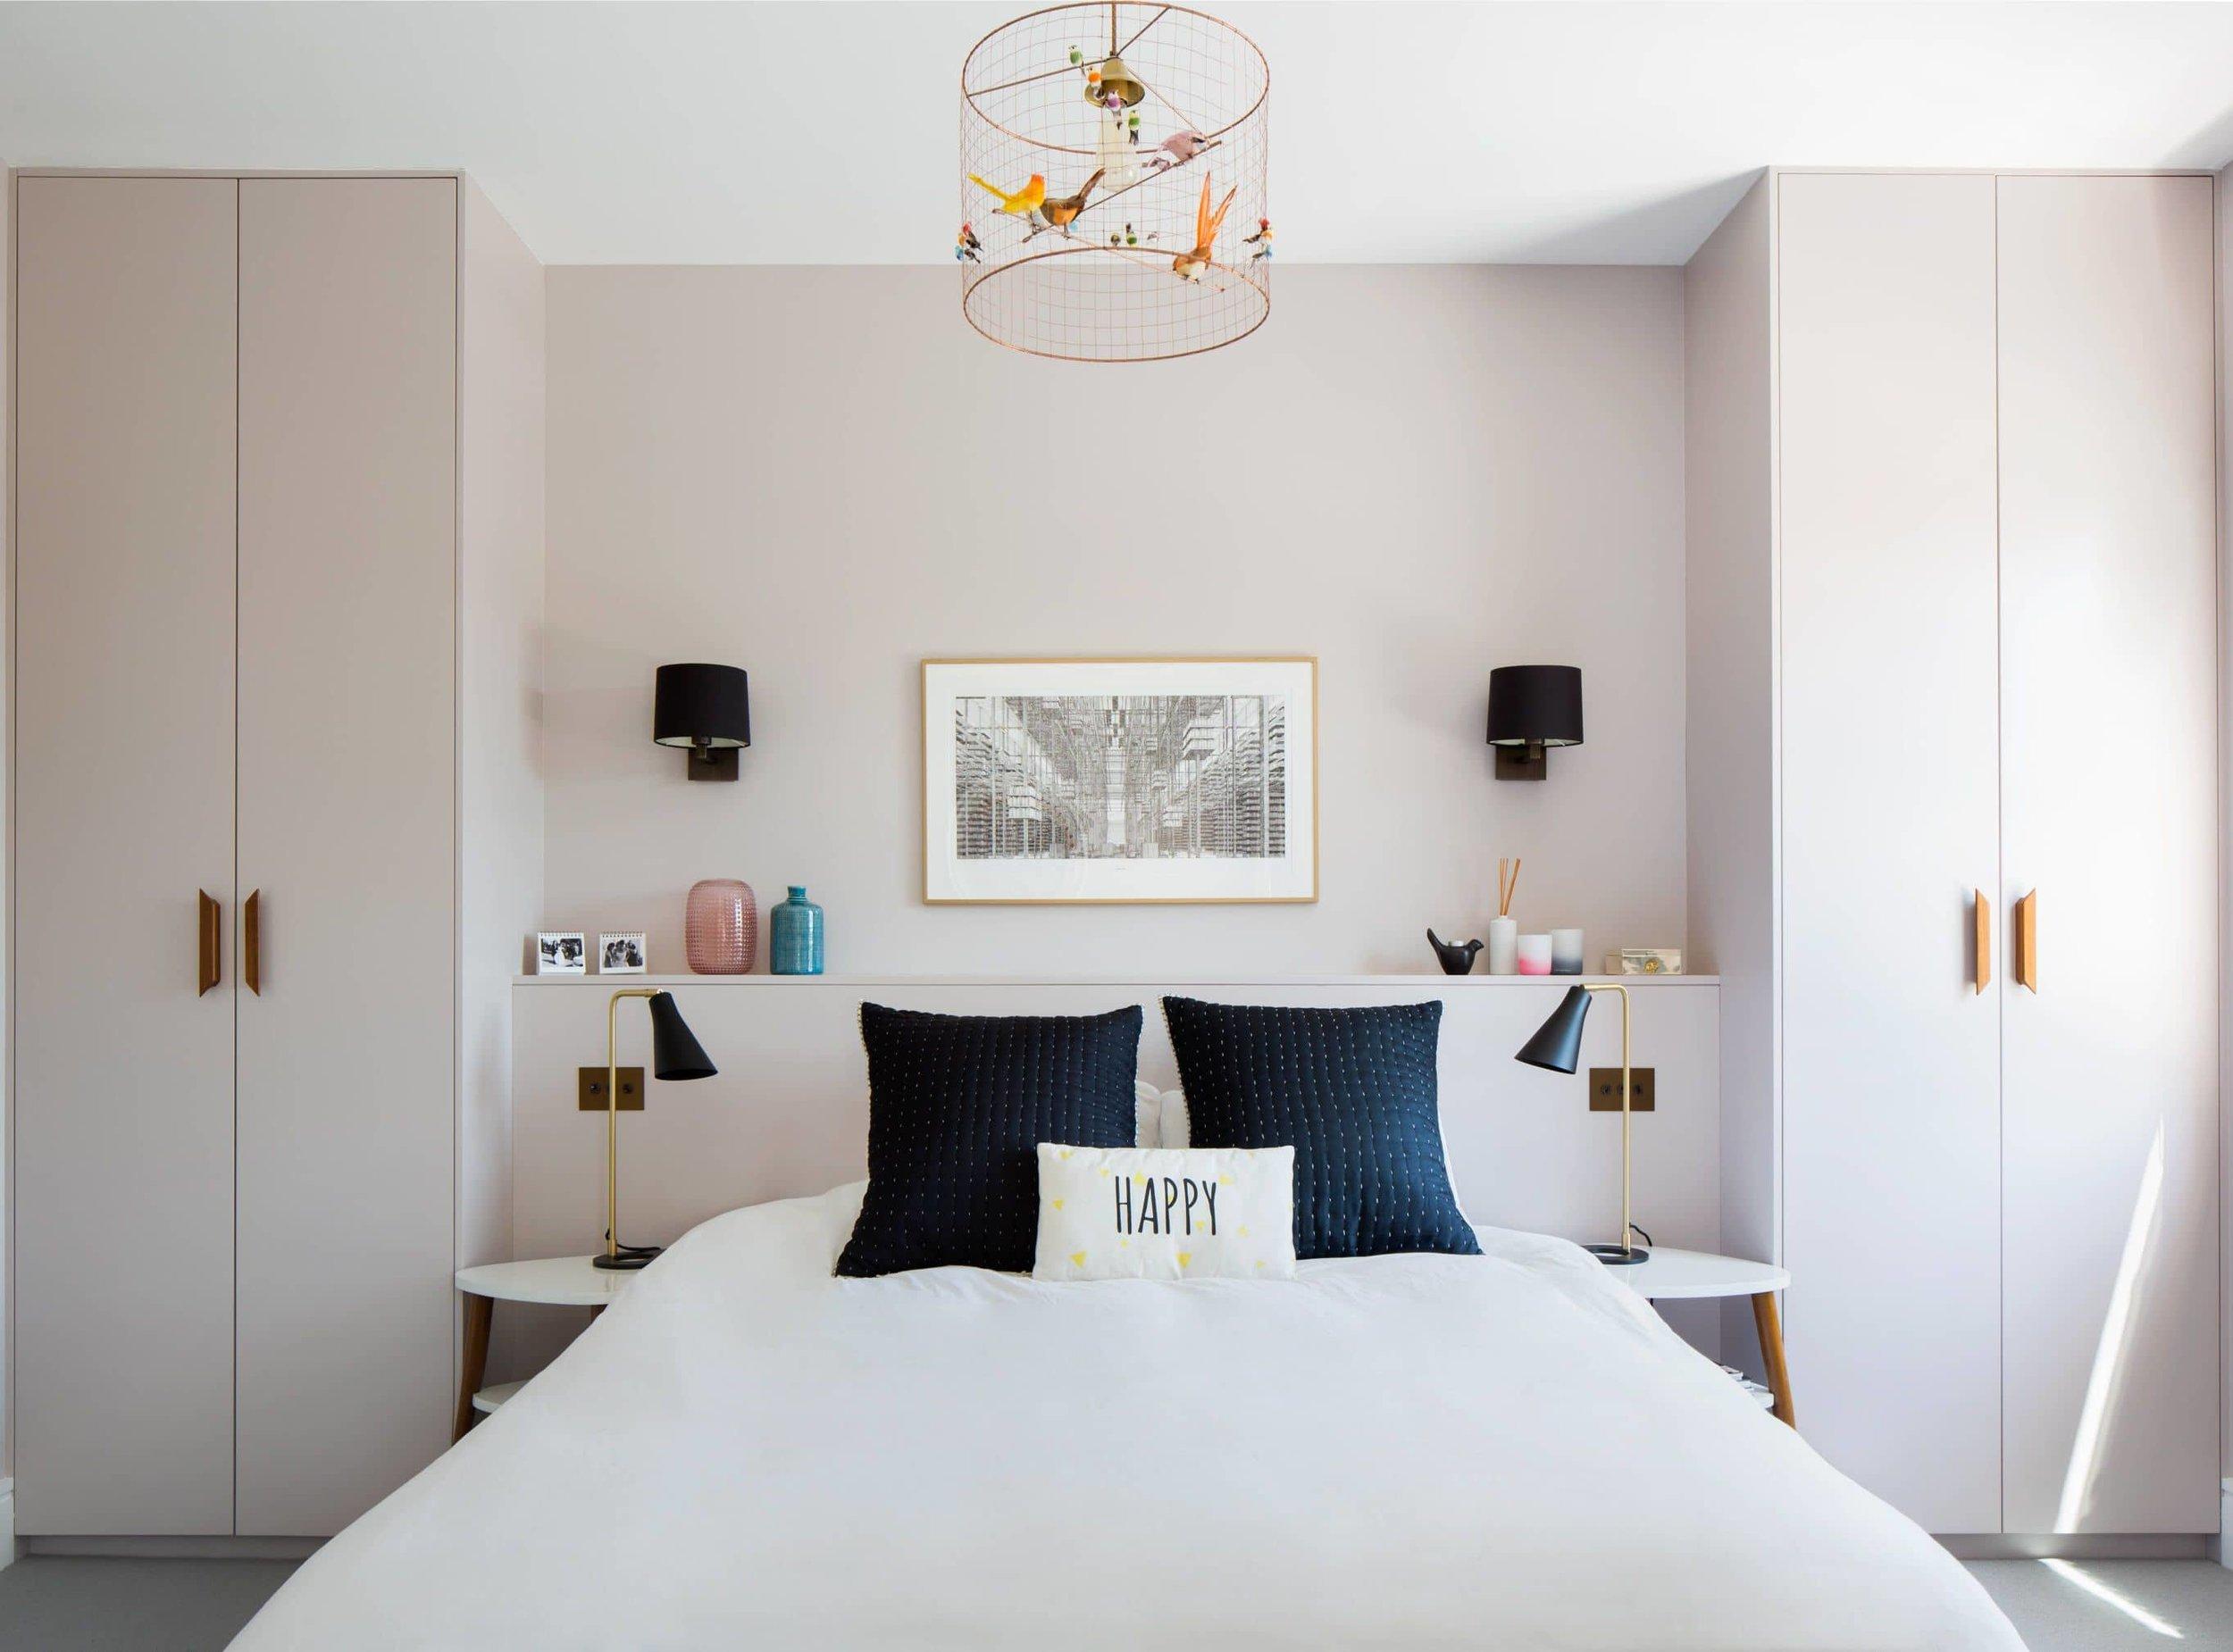 Fulham-Master-Bedroom-Suite-Refurbishment-London-1.jpg